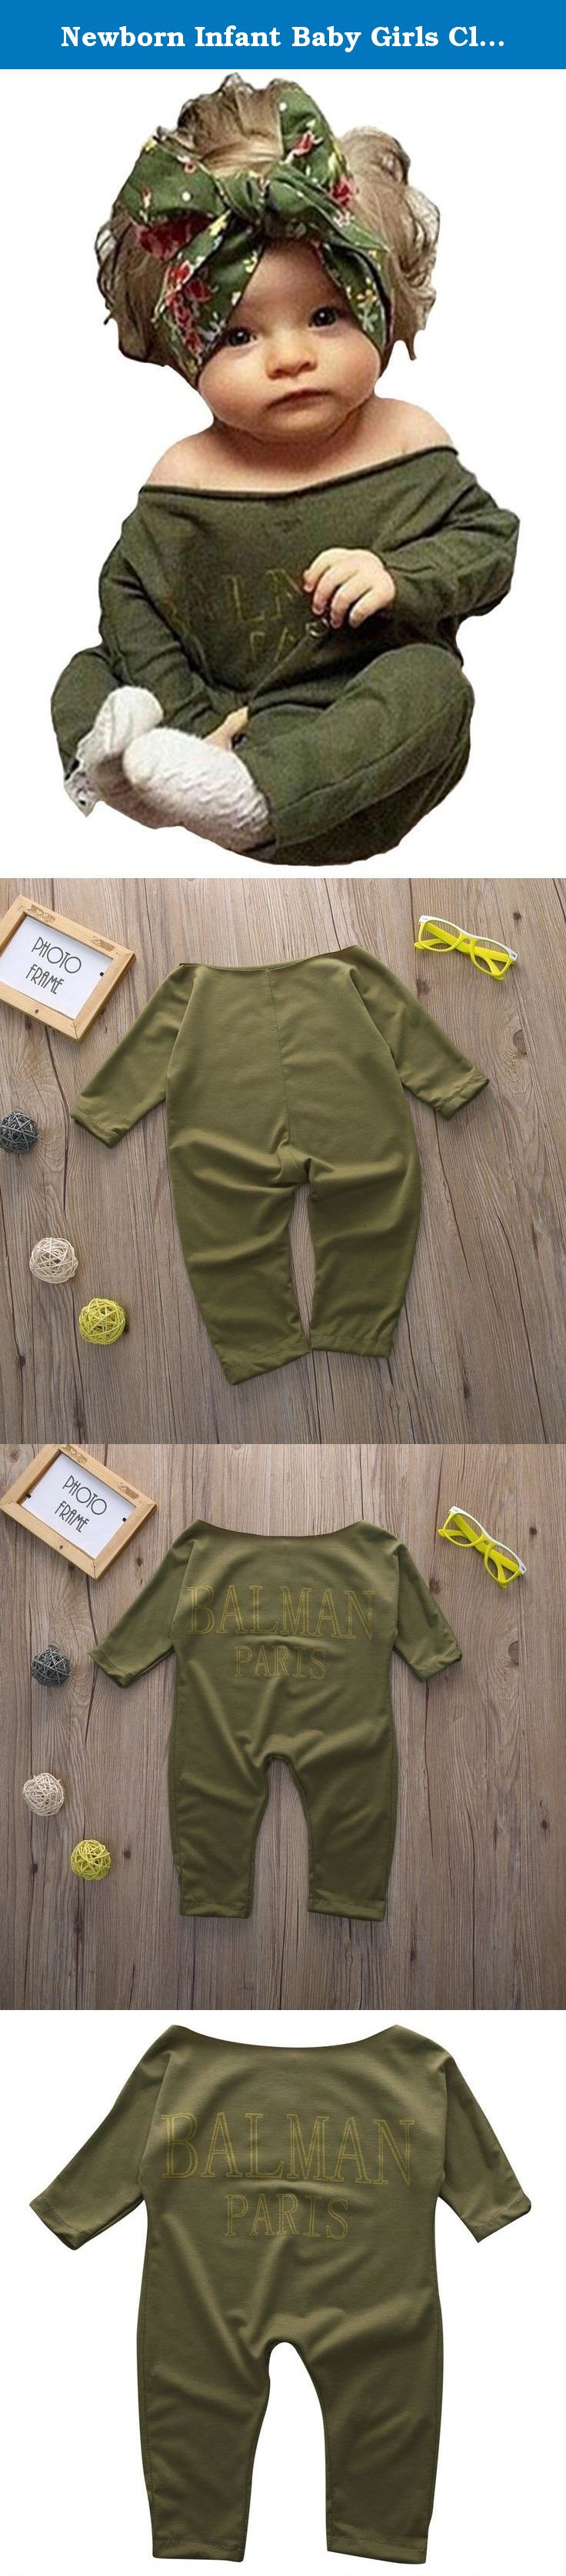 1b1d8e58e93b Newborn Infant Baby Girls Clothes Long Sleeve Off Shoulder Romper Jumpsuit  (M(6-